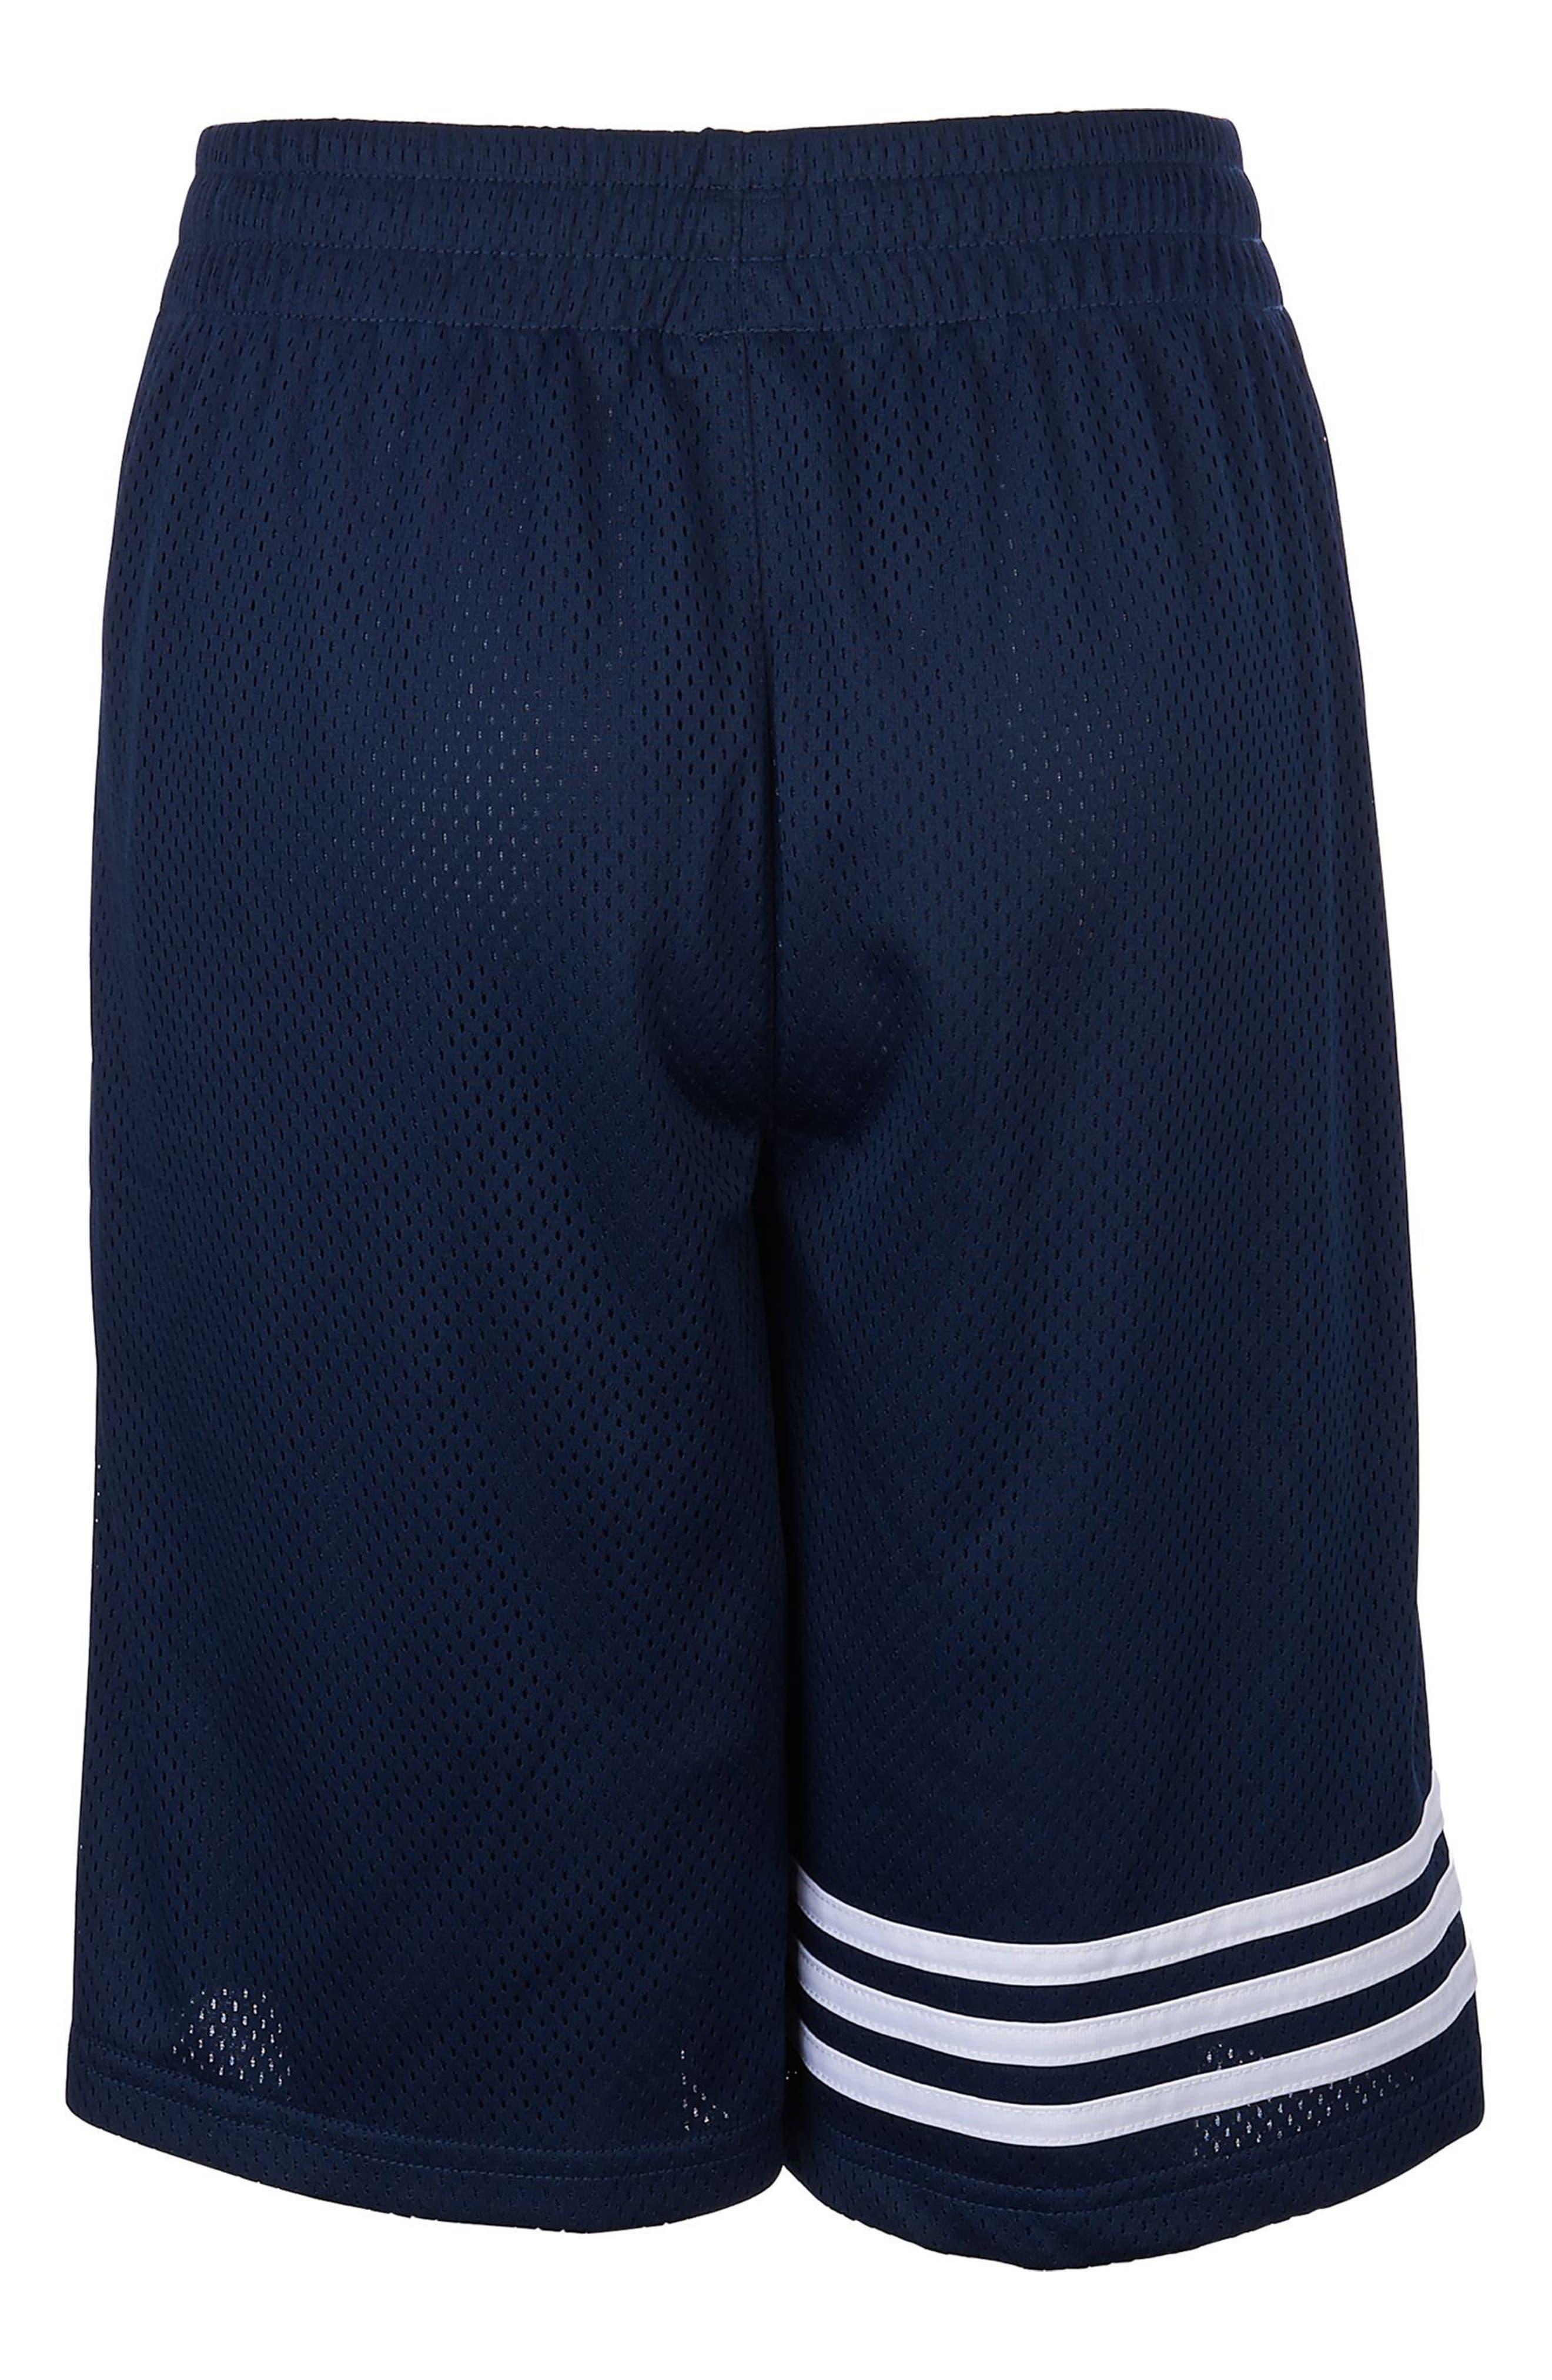 Replenishment Defender Shorts,                             Alternate thumbnail 6, color,